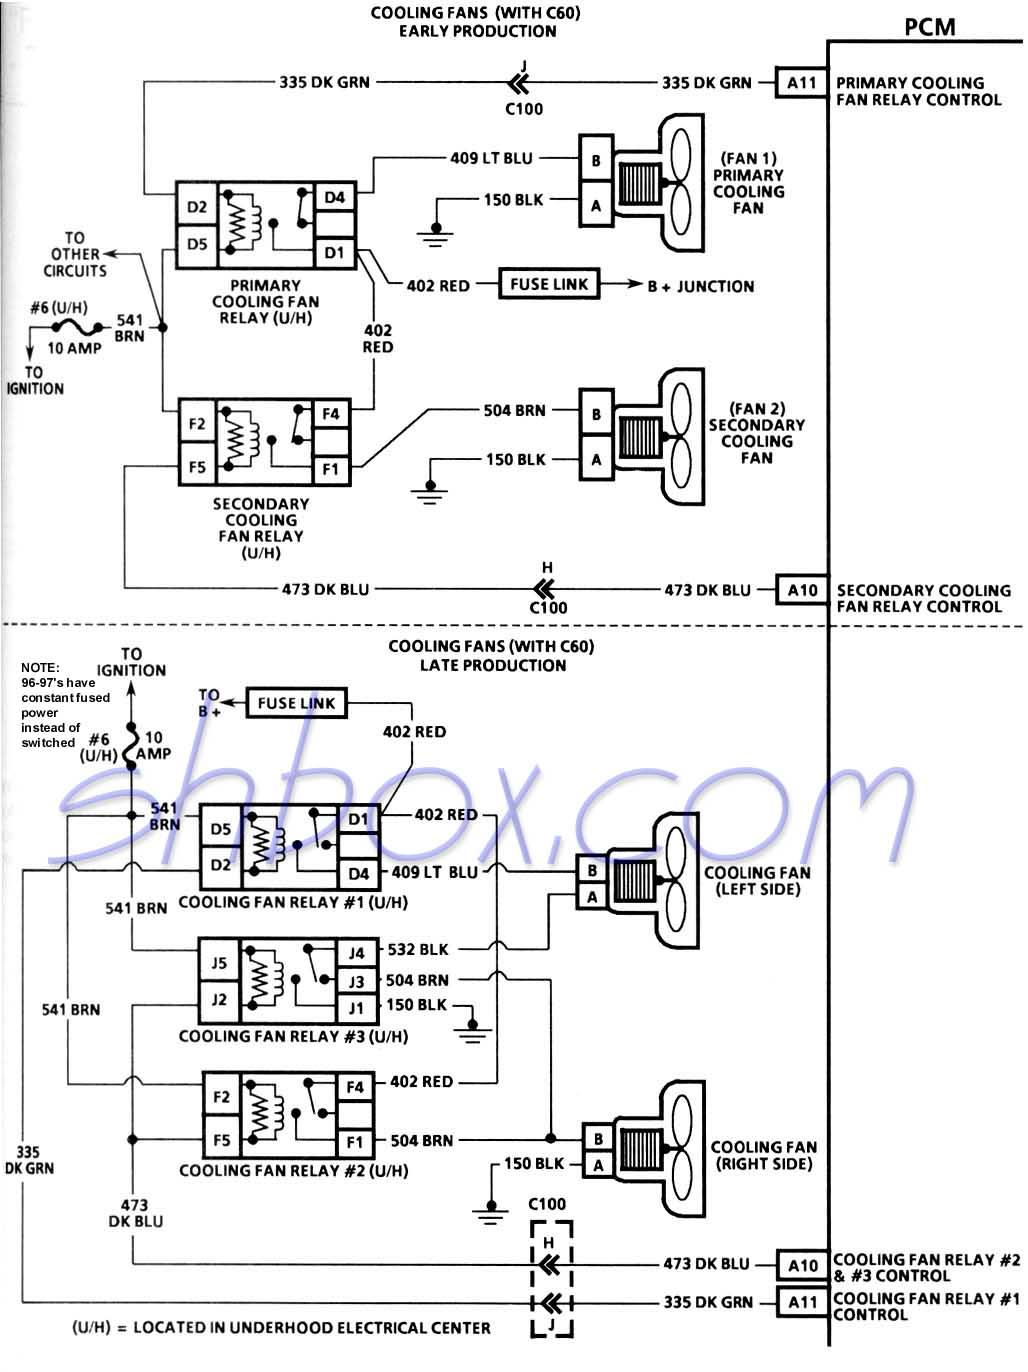 Stupendous Lt1 Wiring Diagram Wiring Diagram Data Wiring Cloud Timewinrebemohammedshrineorg